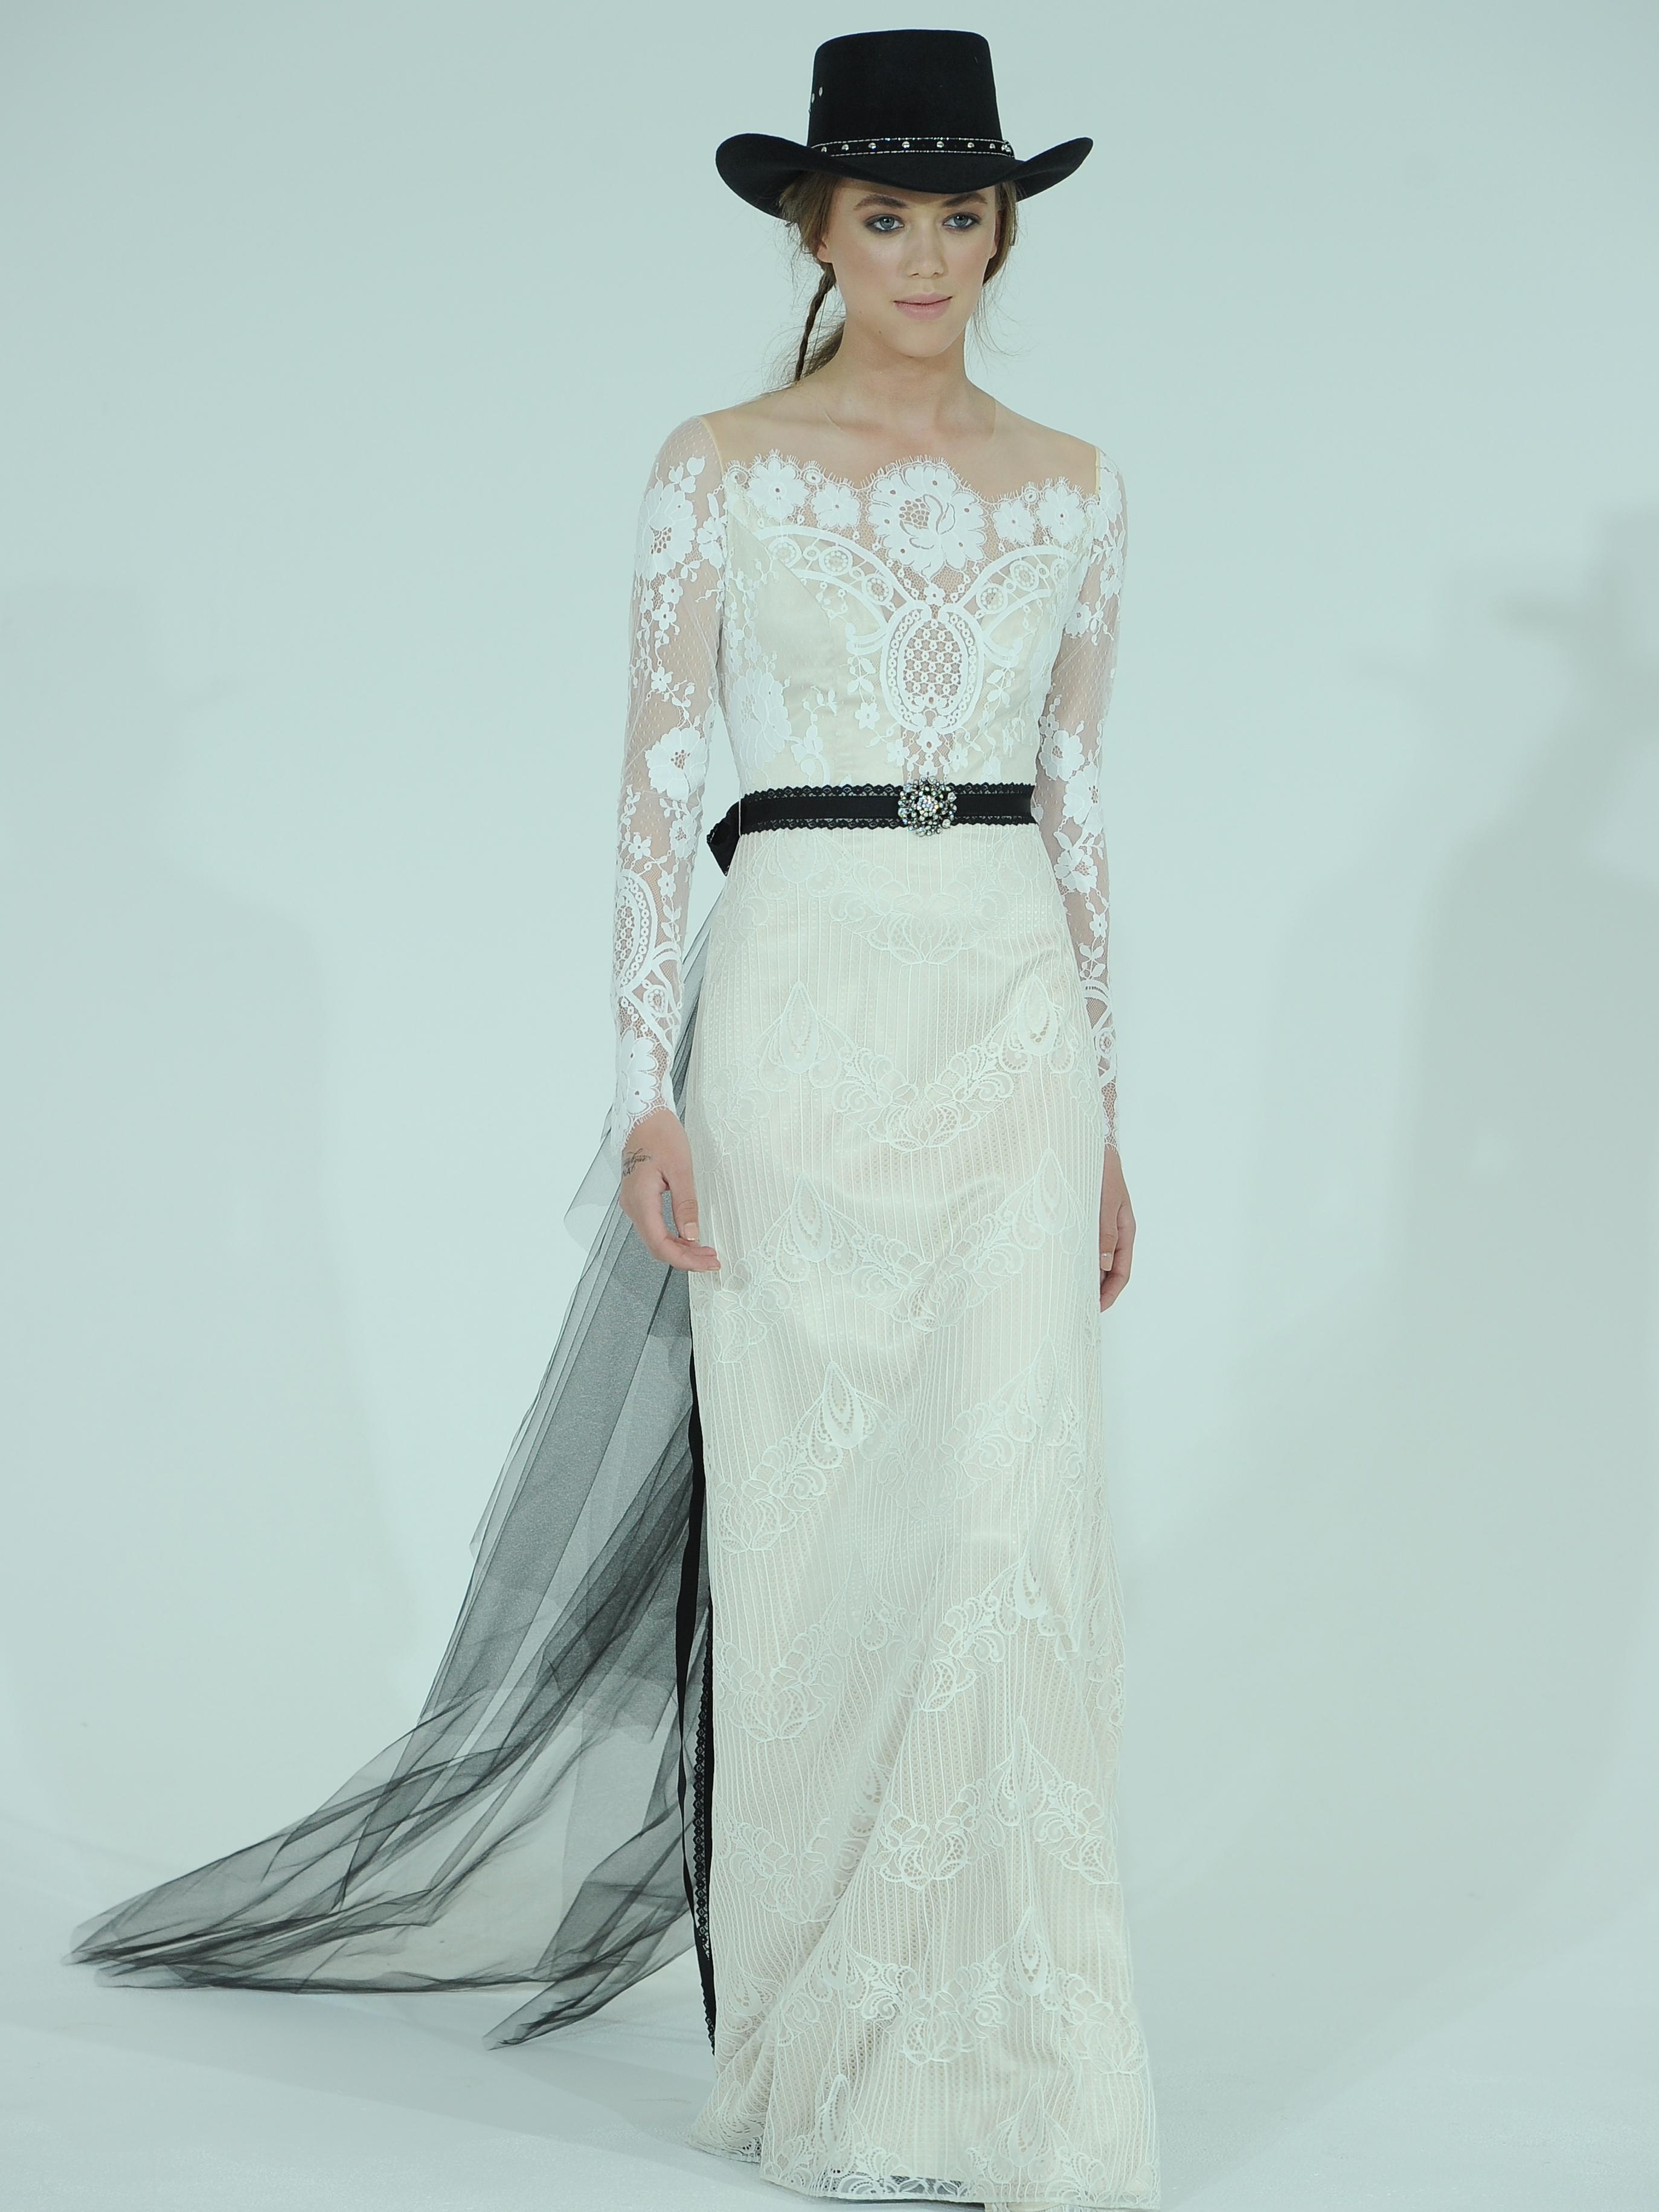 old west wedding dresses | Wedding